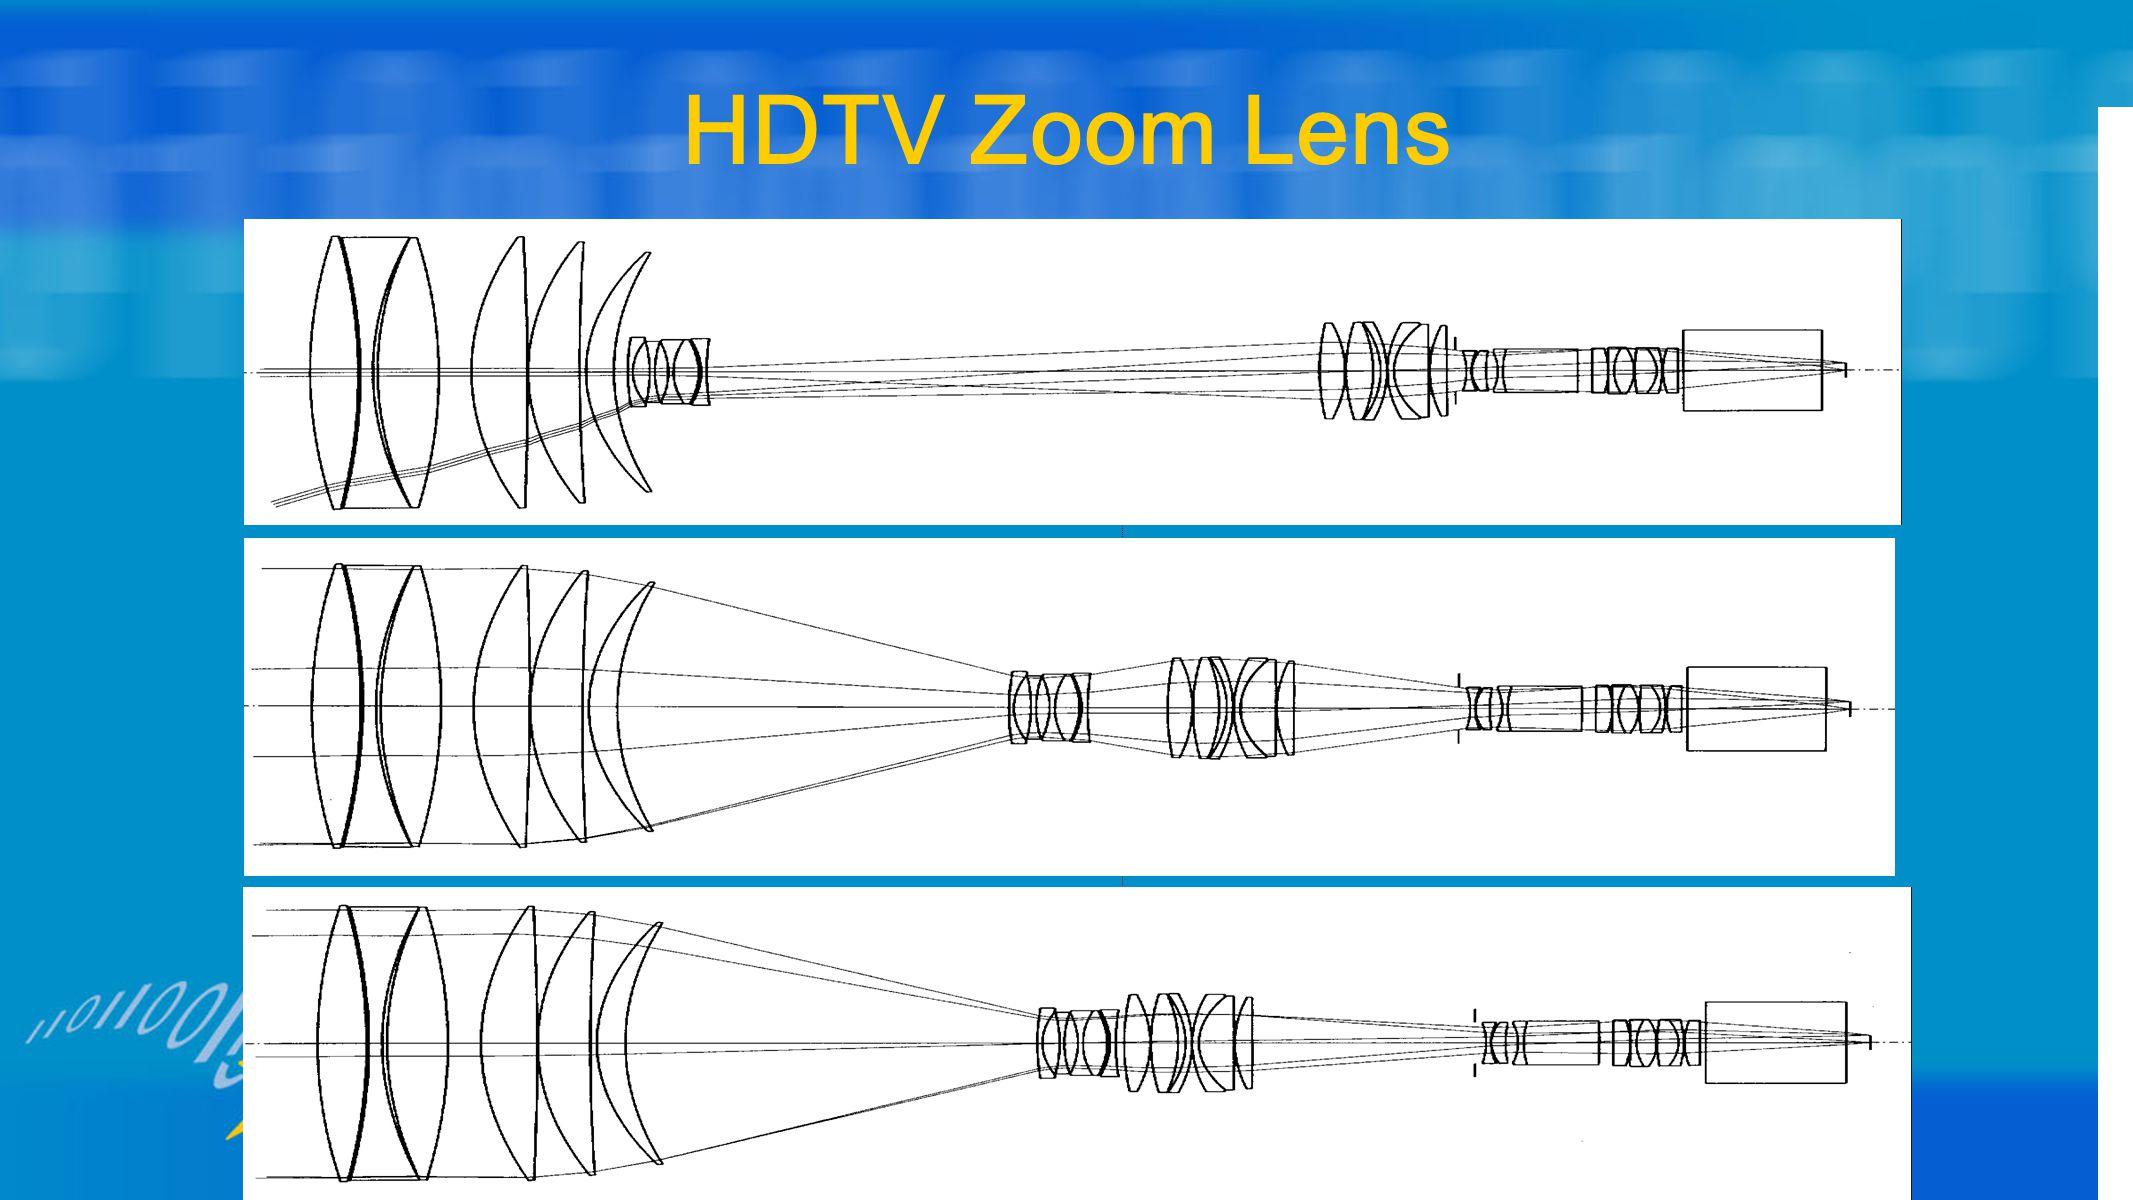 HDTV Zoom Lens Wide Angle Telephoto Mid Zoom Range